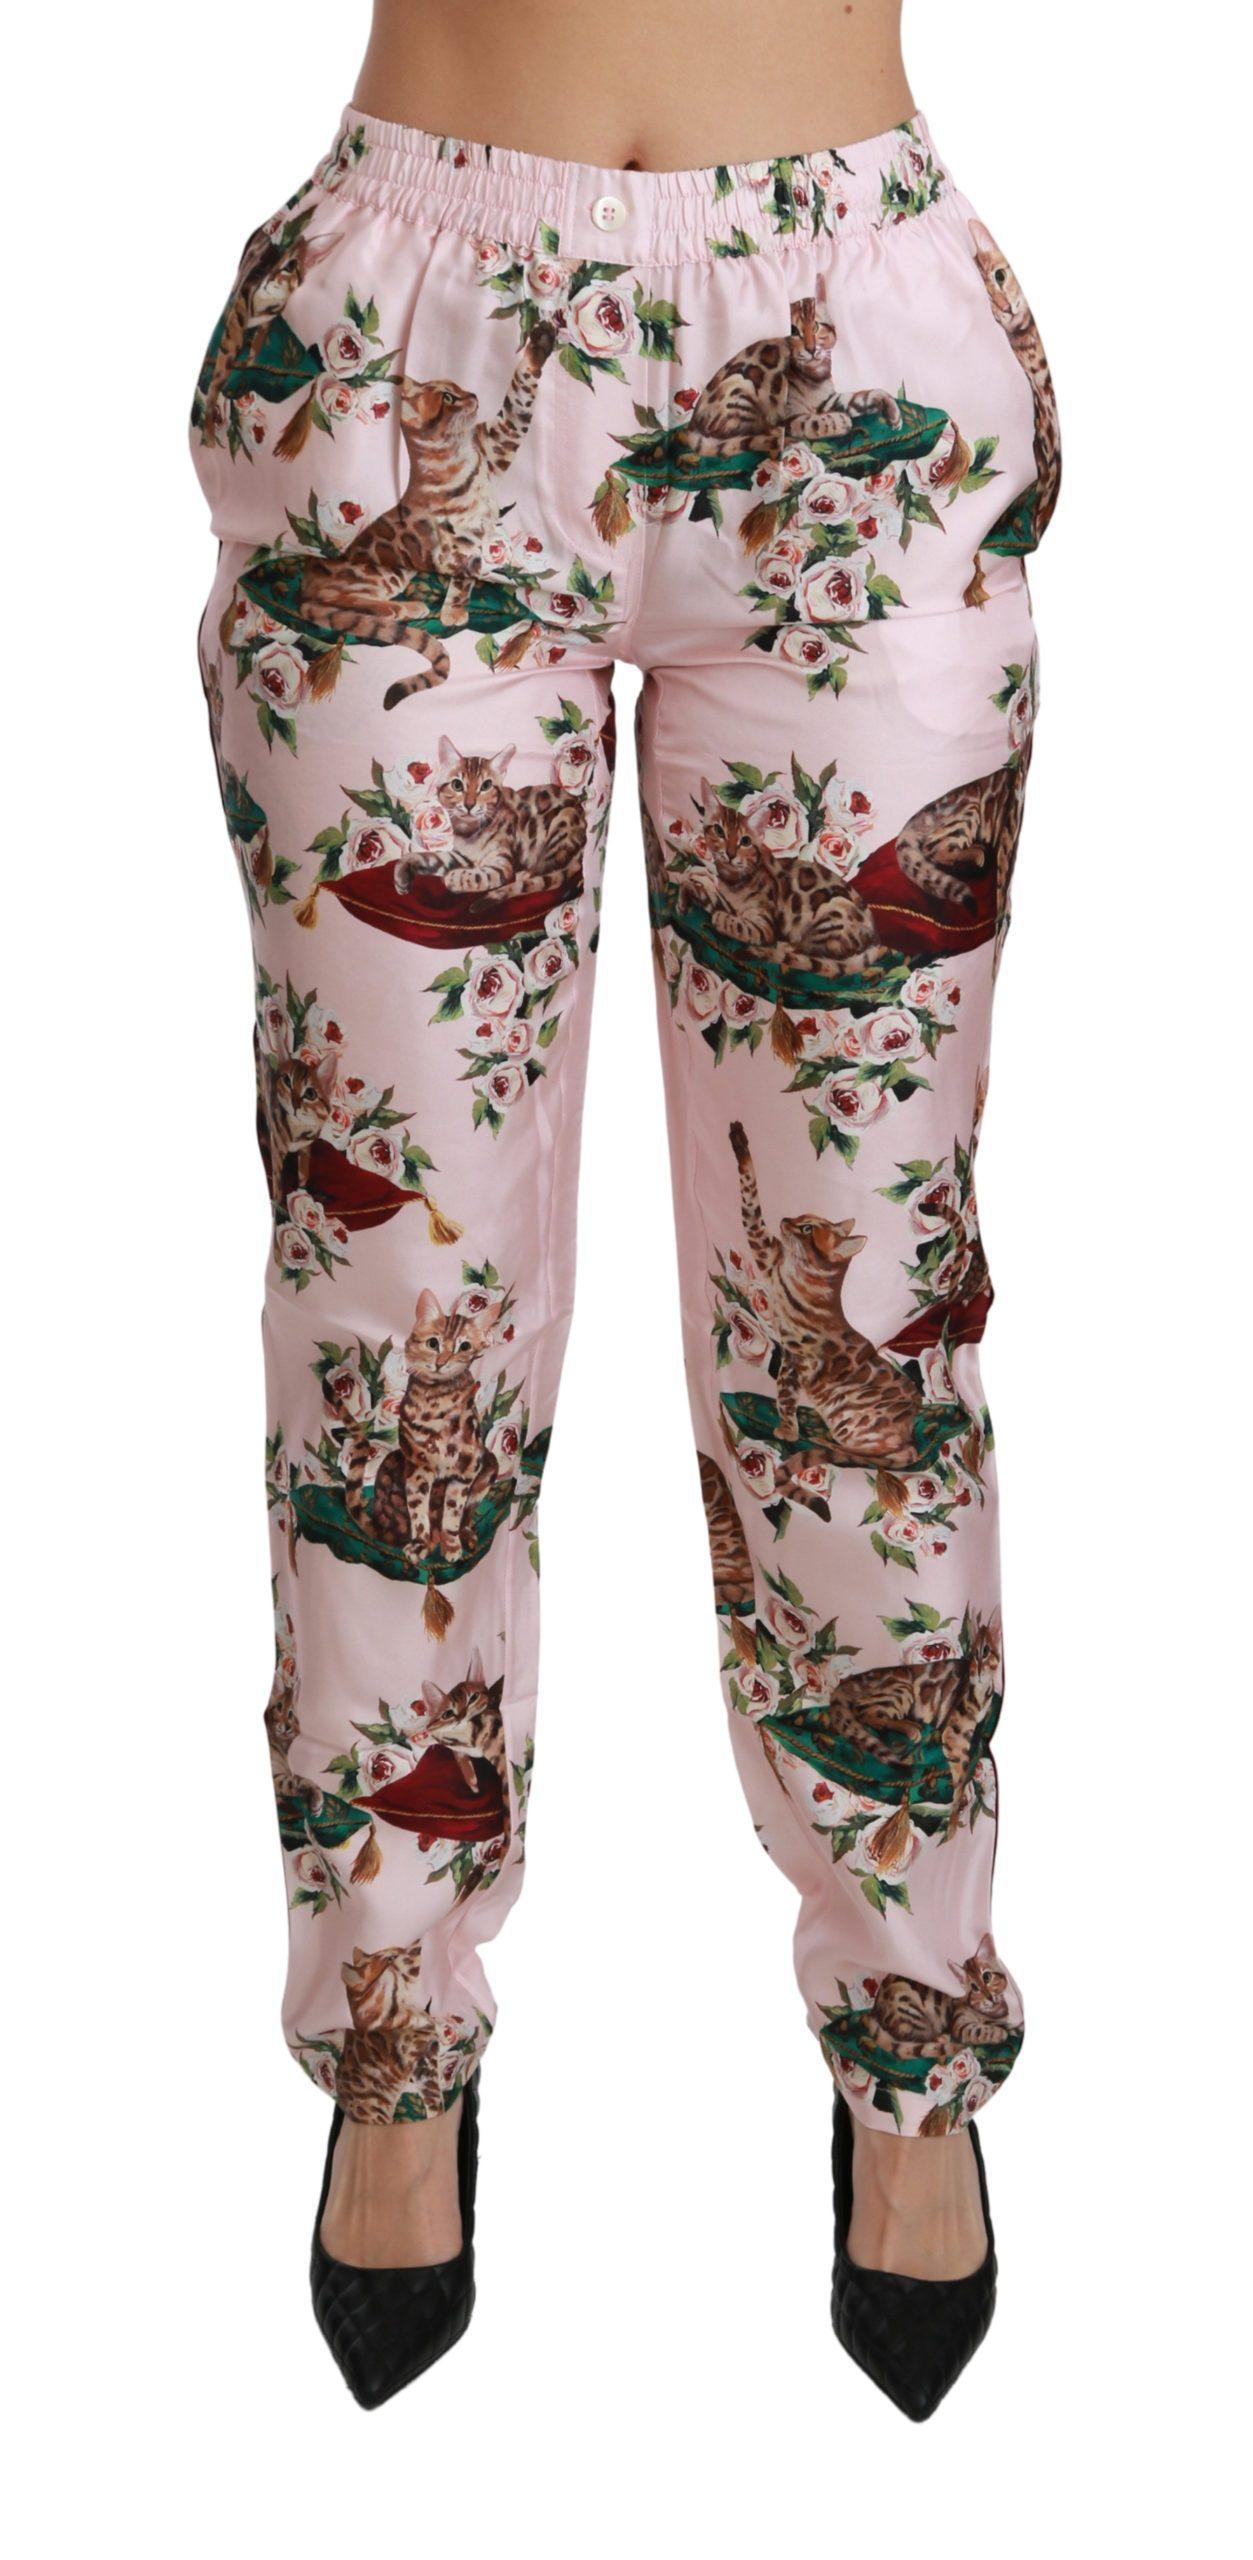 Dolce & Gabbana Women's Bengal Cat Trousers Silk Trouser Pink PAN70900 - IT40|S